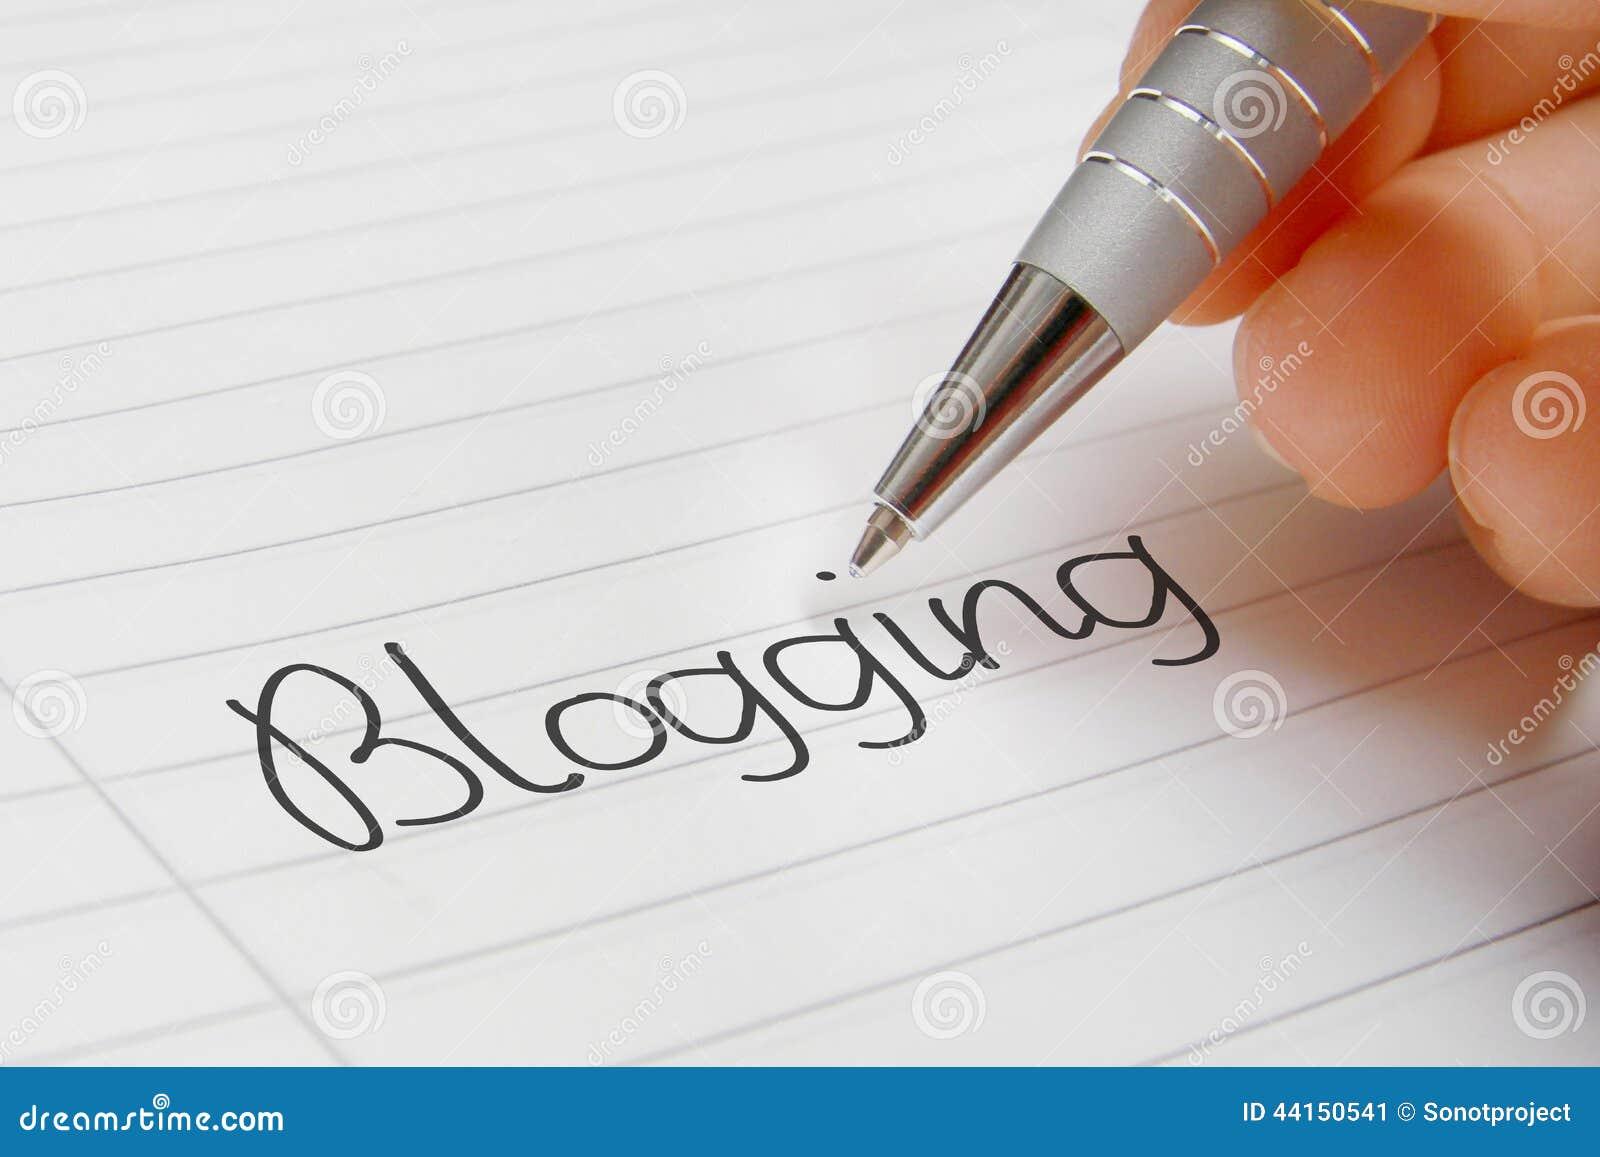 Blogging word handwriting